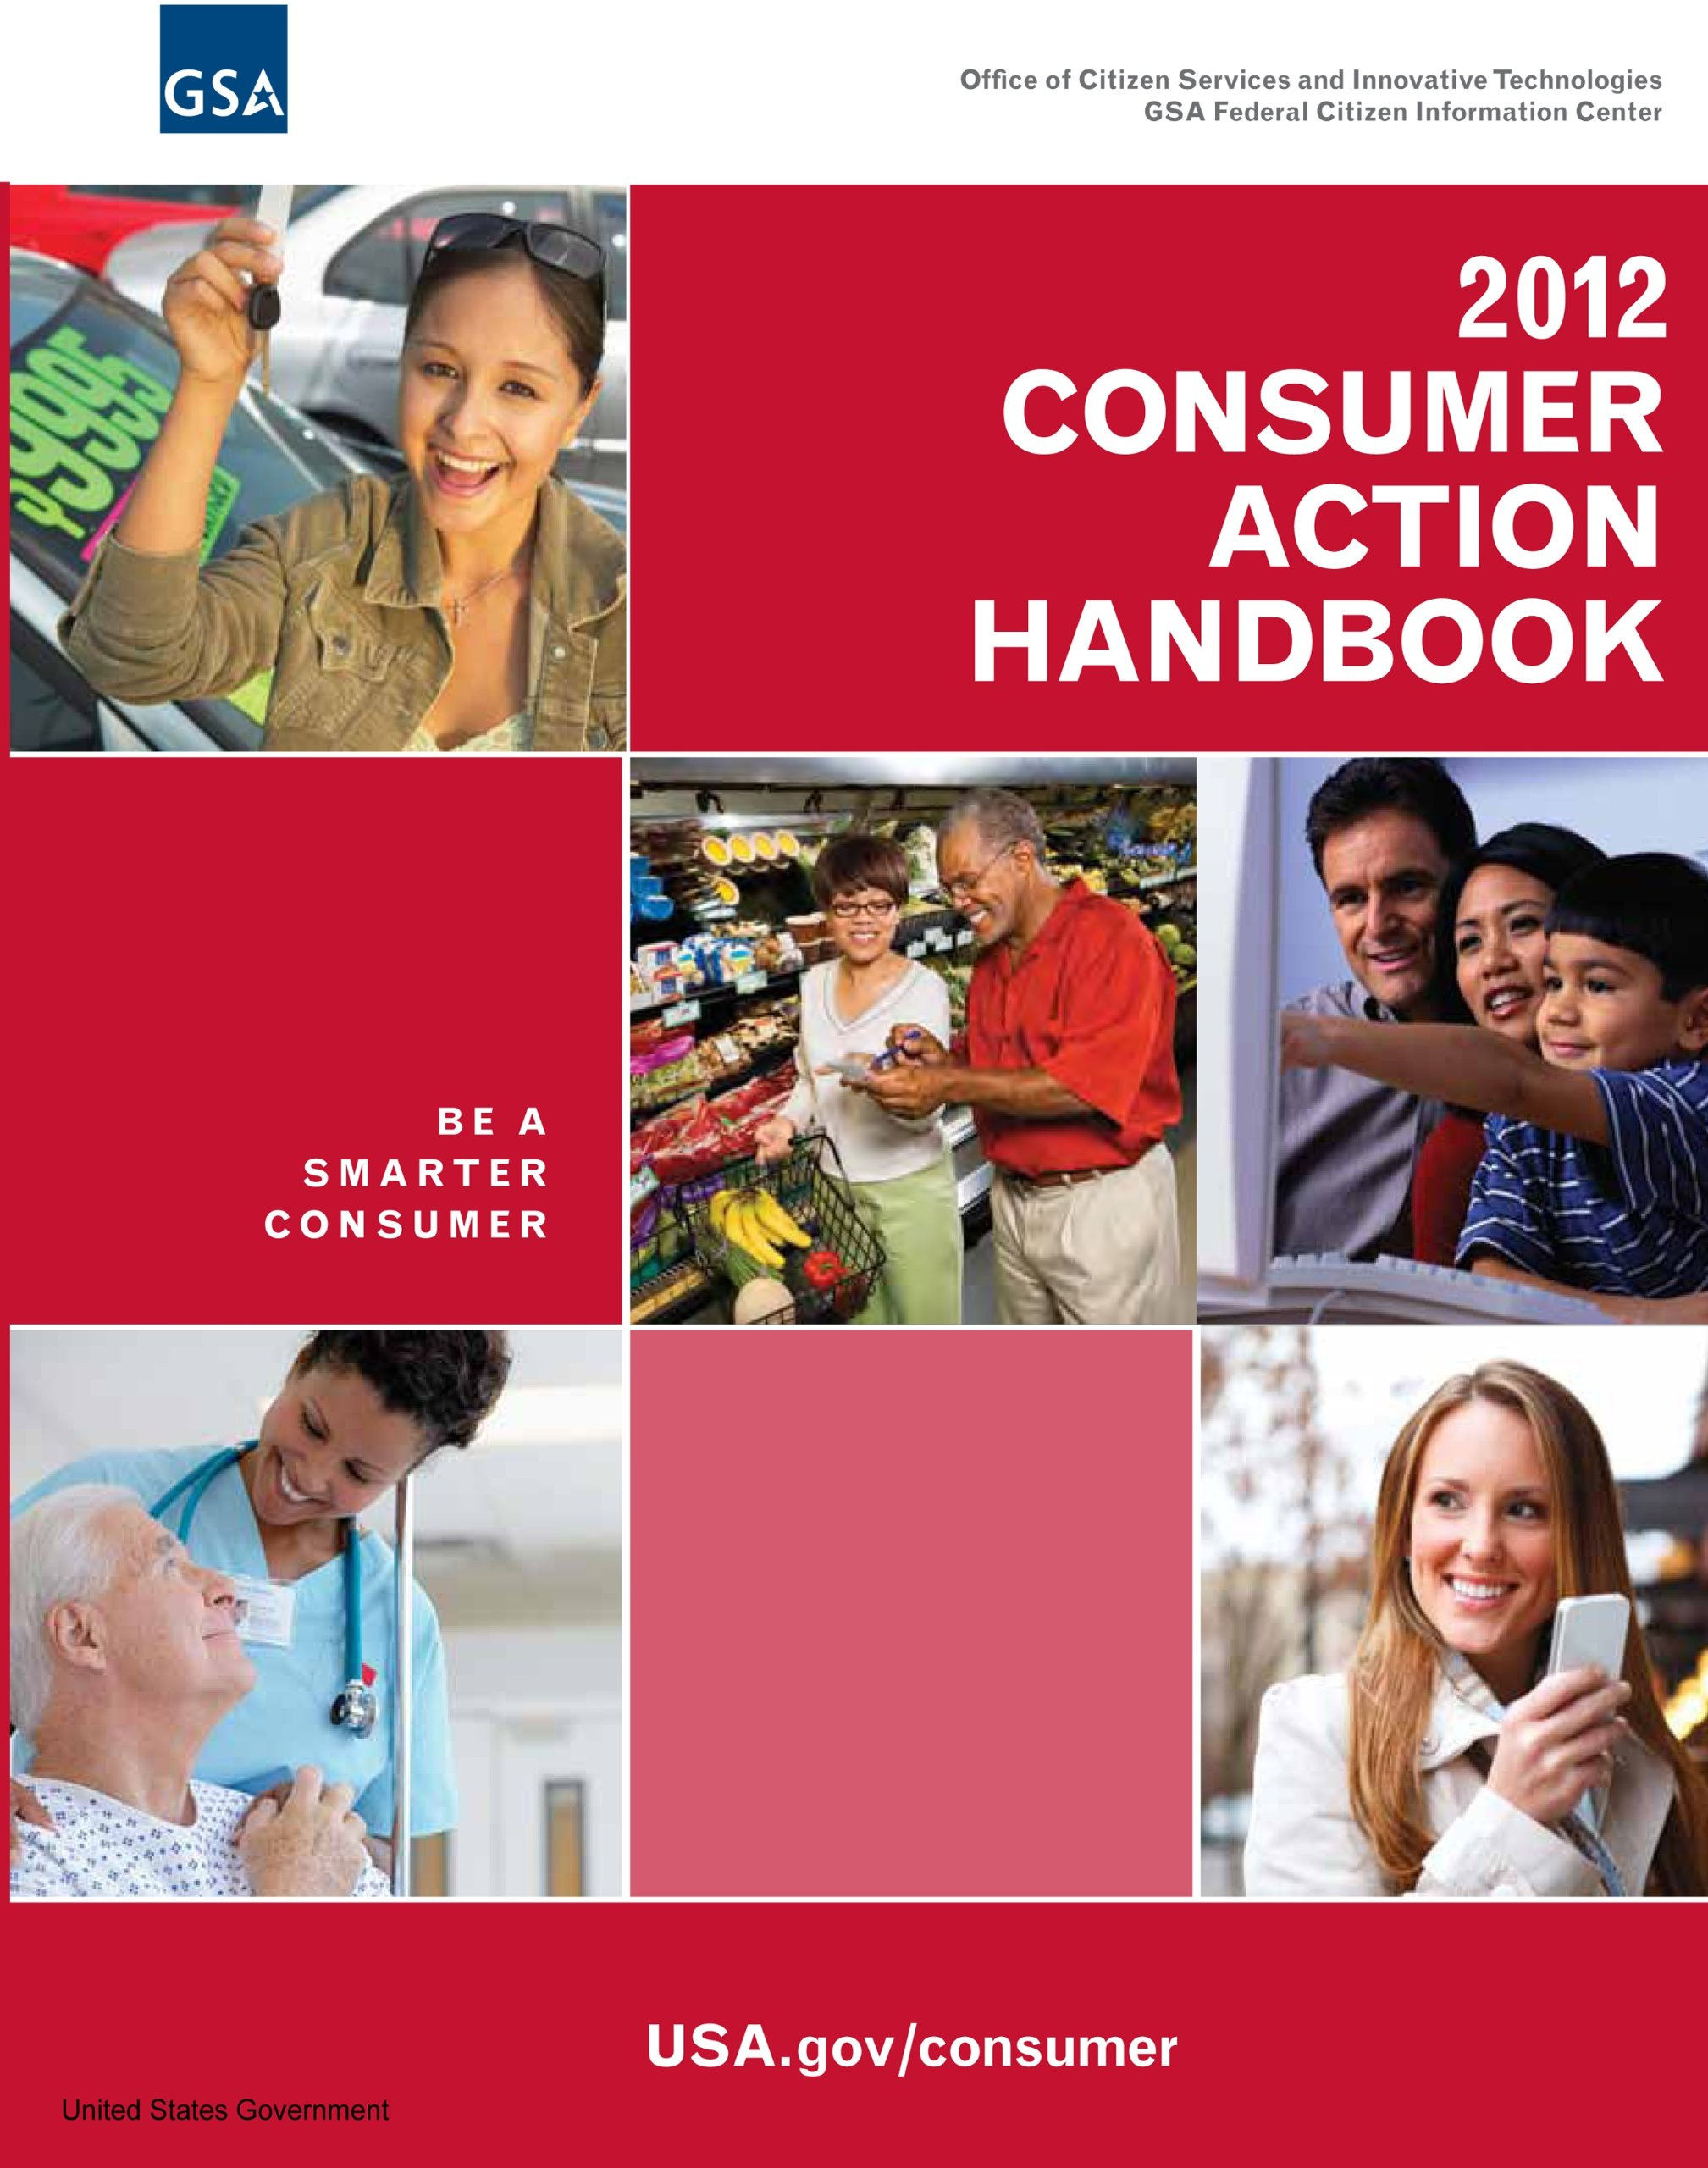 2012 Consumer Action Handbook